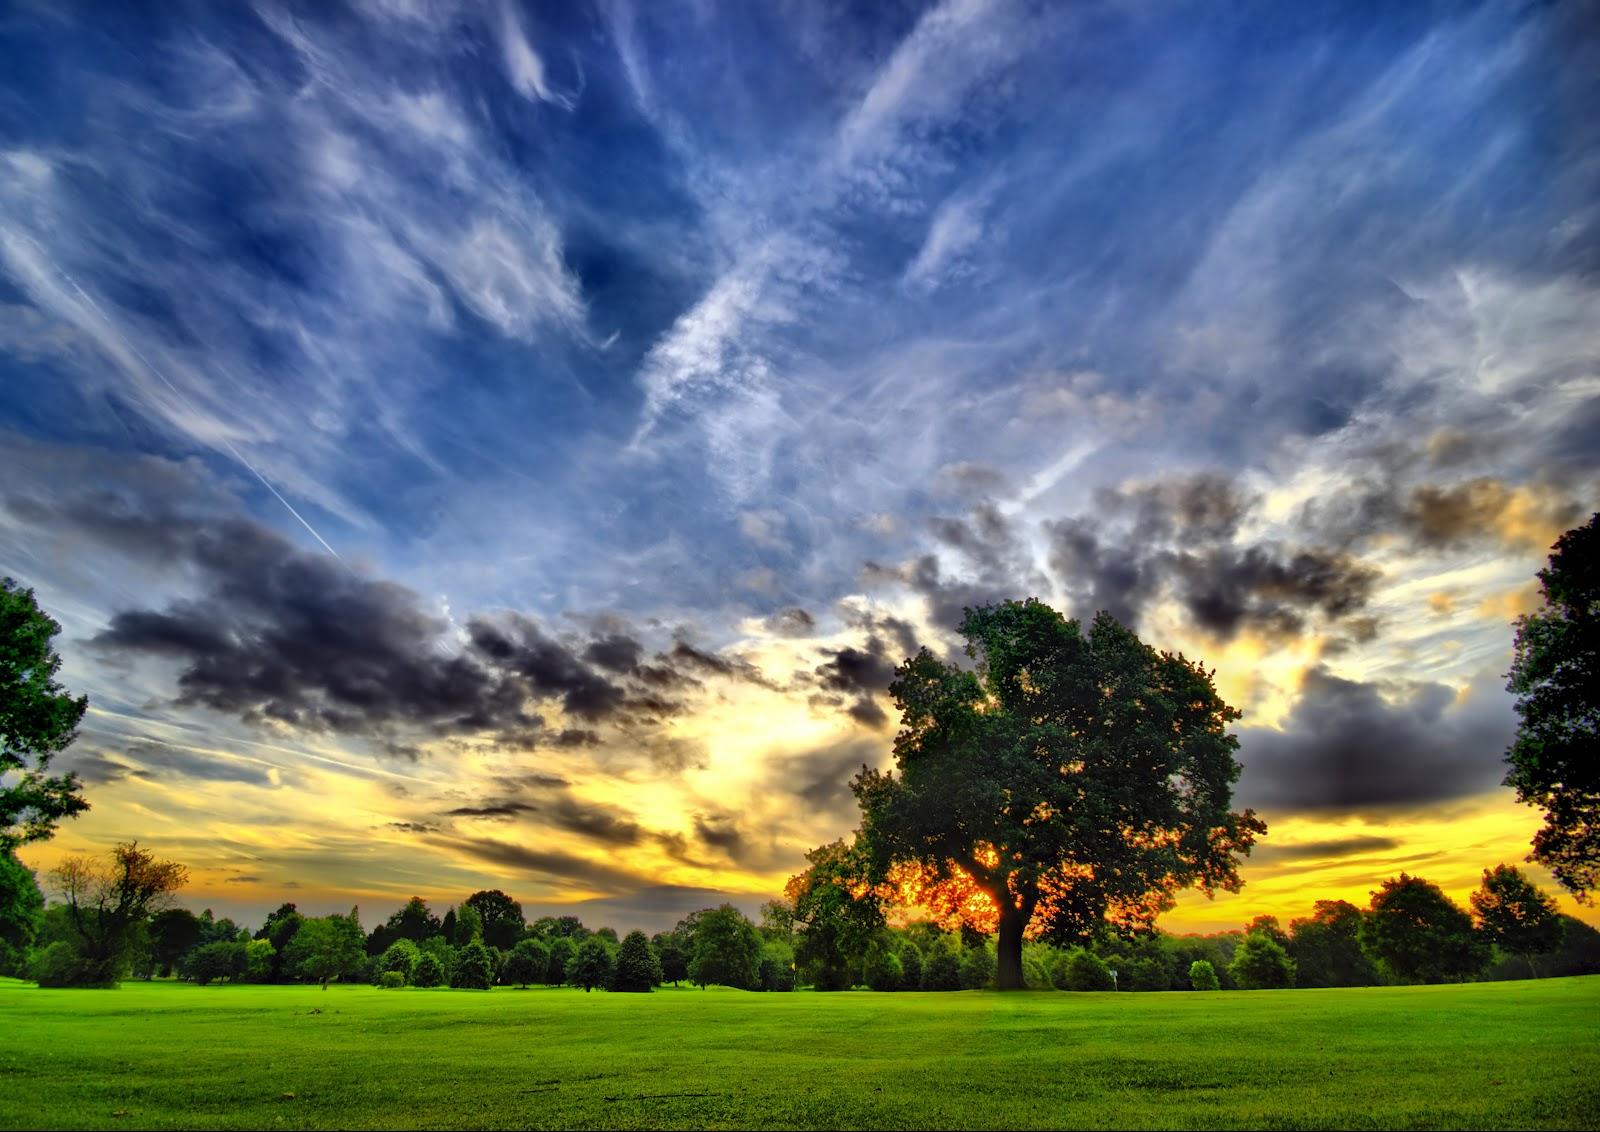 Nature Shutterstock Free Vector